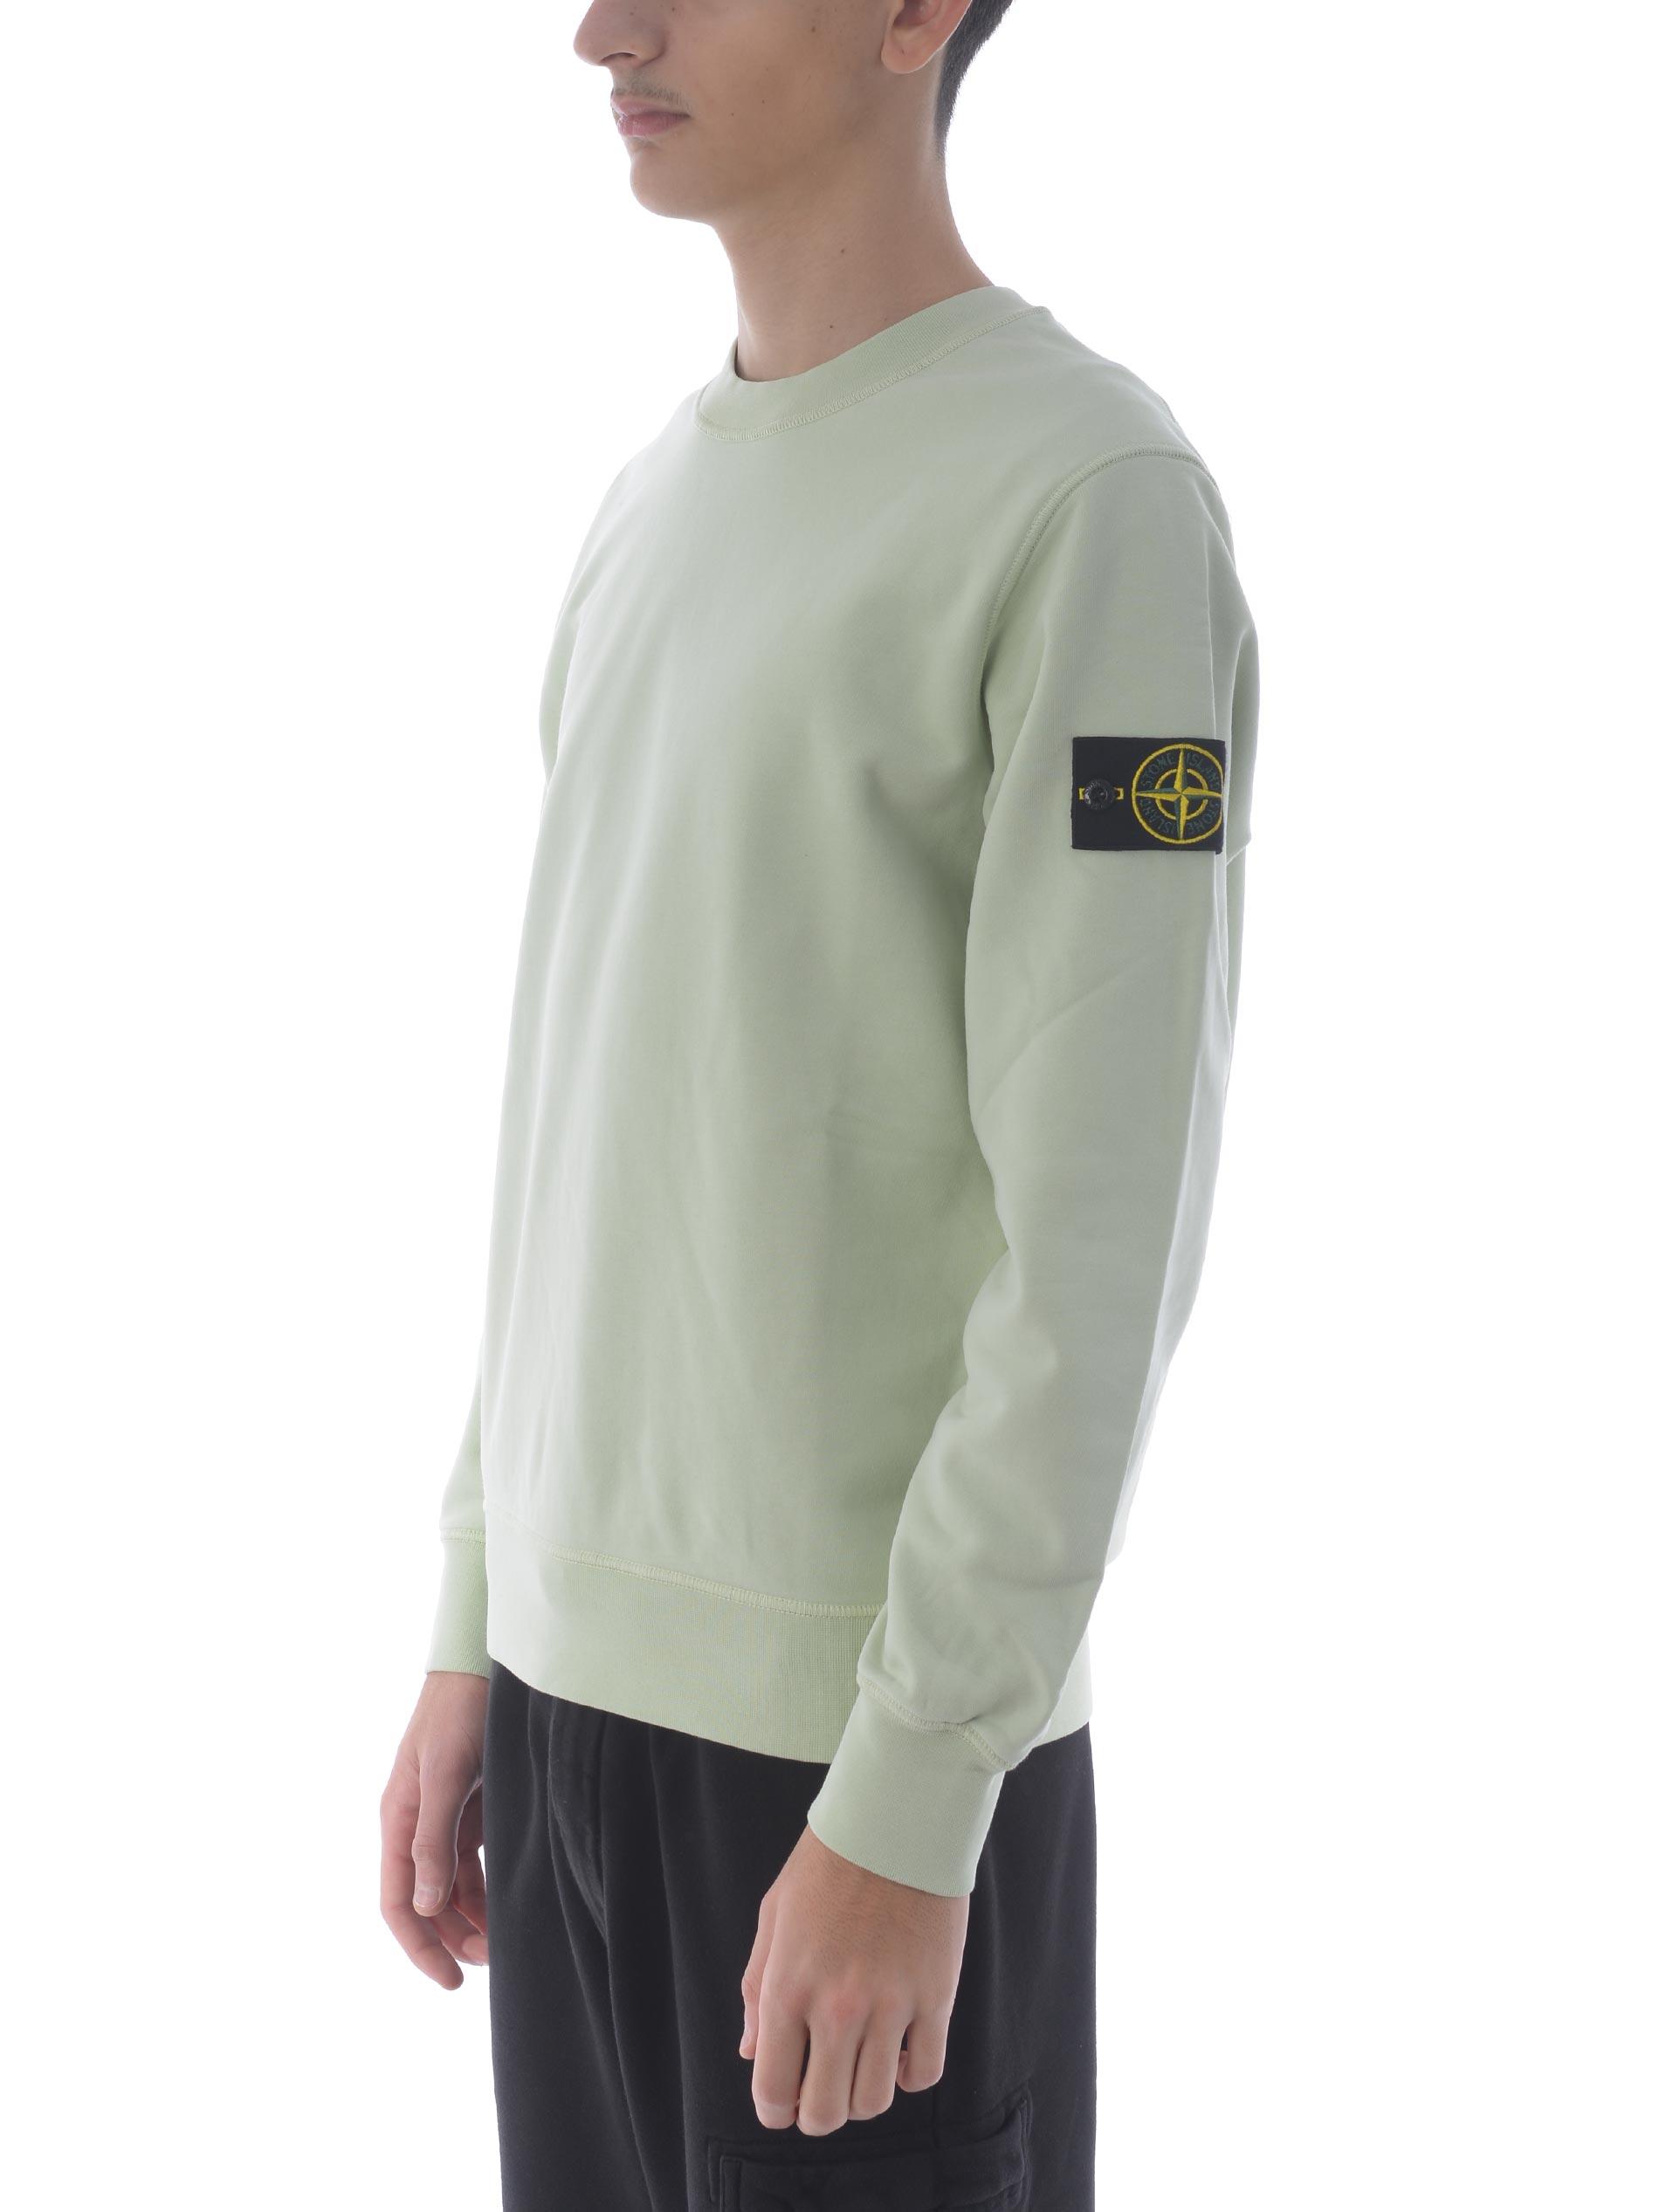 Stone Island cotton sweatshirt  STONE ISLAND   10000005   63051V0052